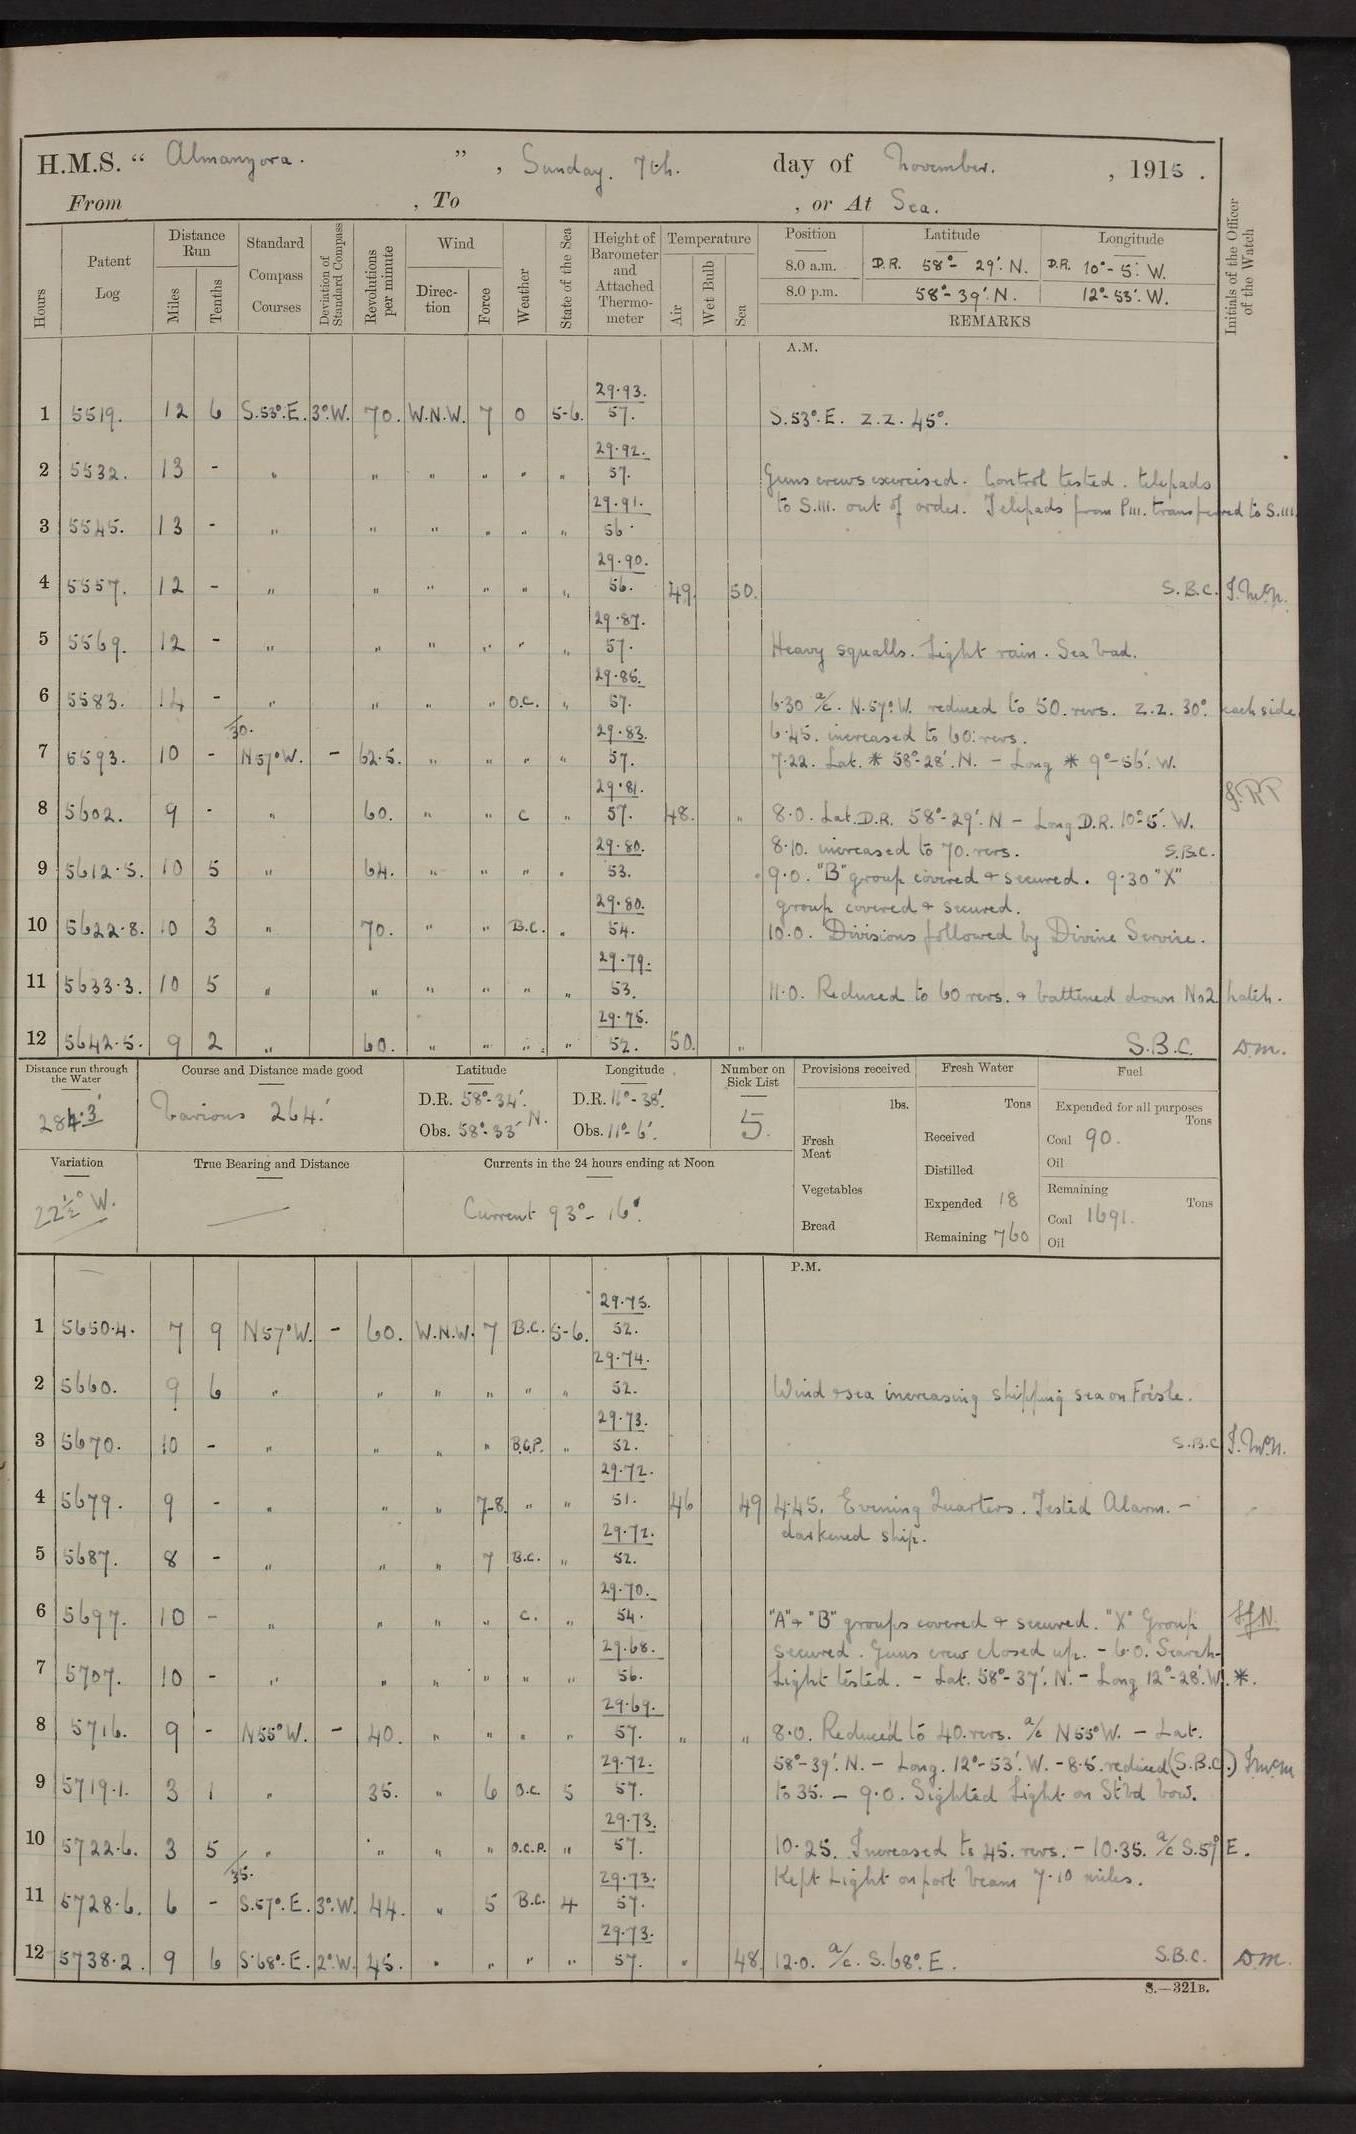 HMS Almanzora, armed merchant cruiser - British warships of